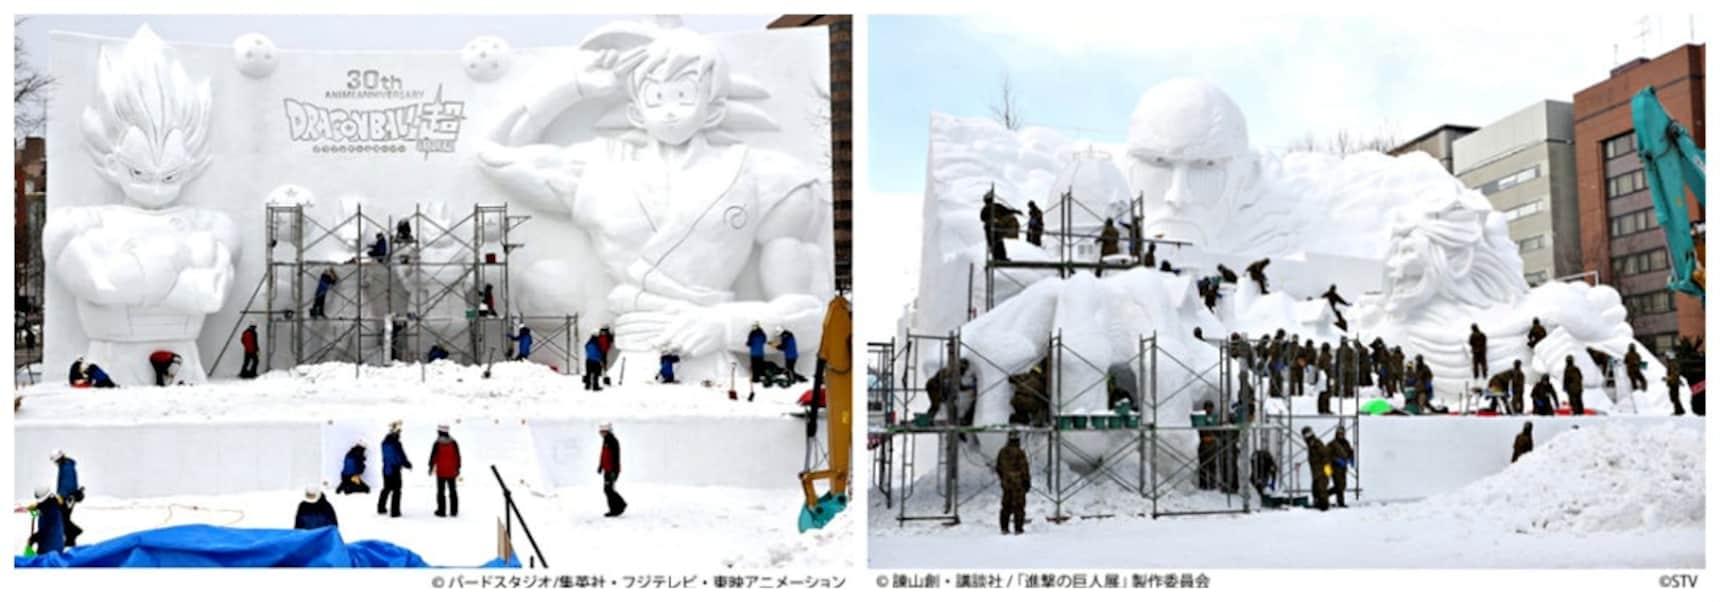 Ginormous Anime Snow Sculptures